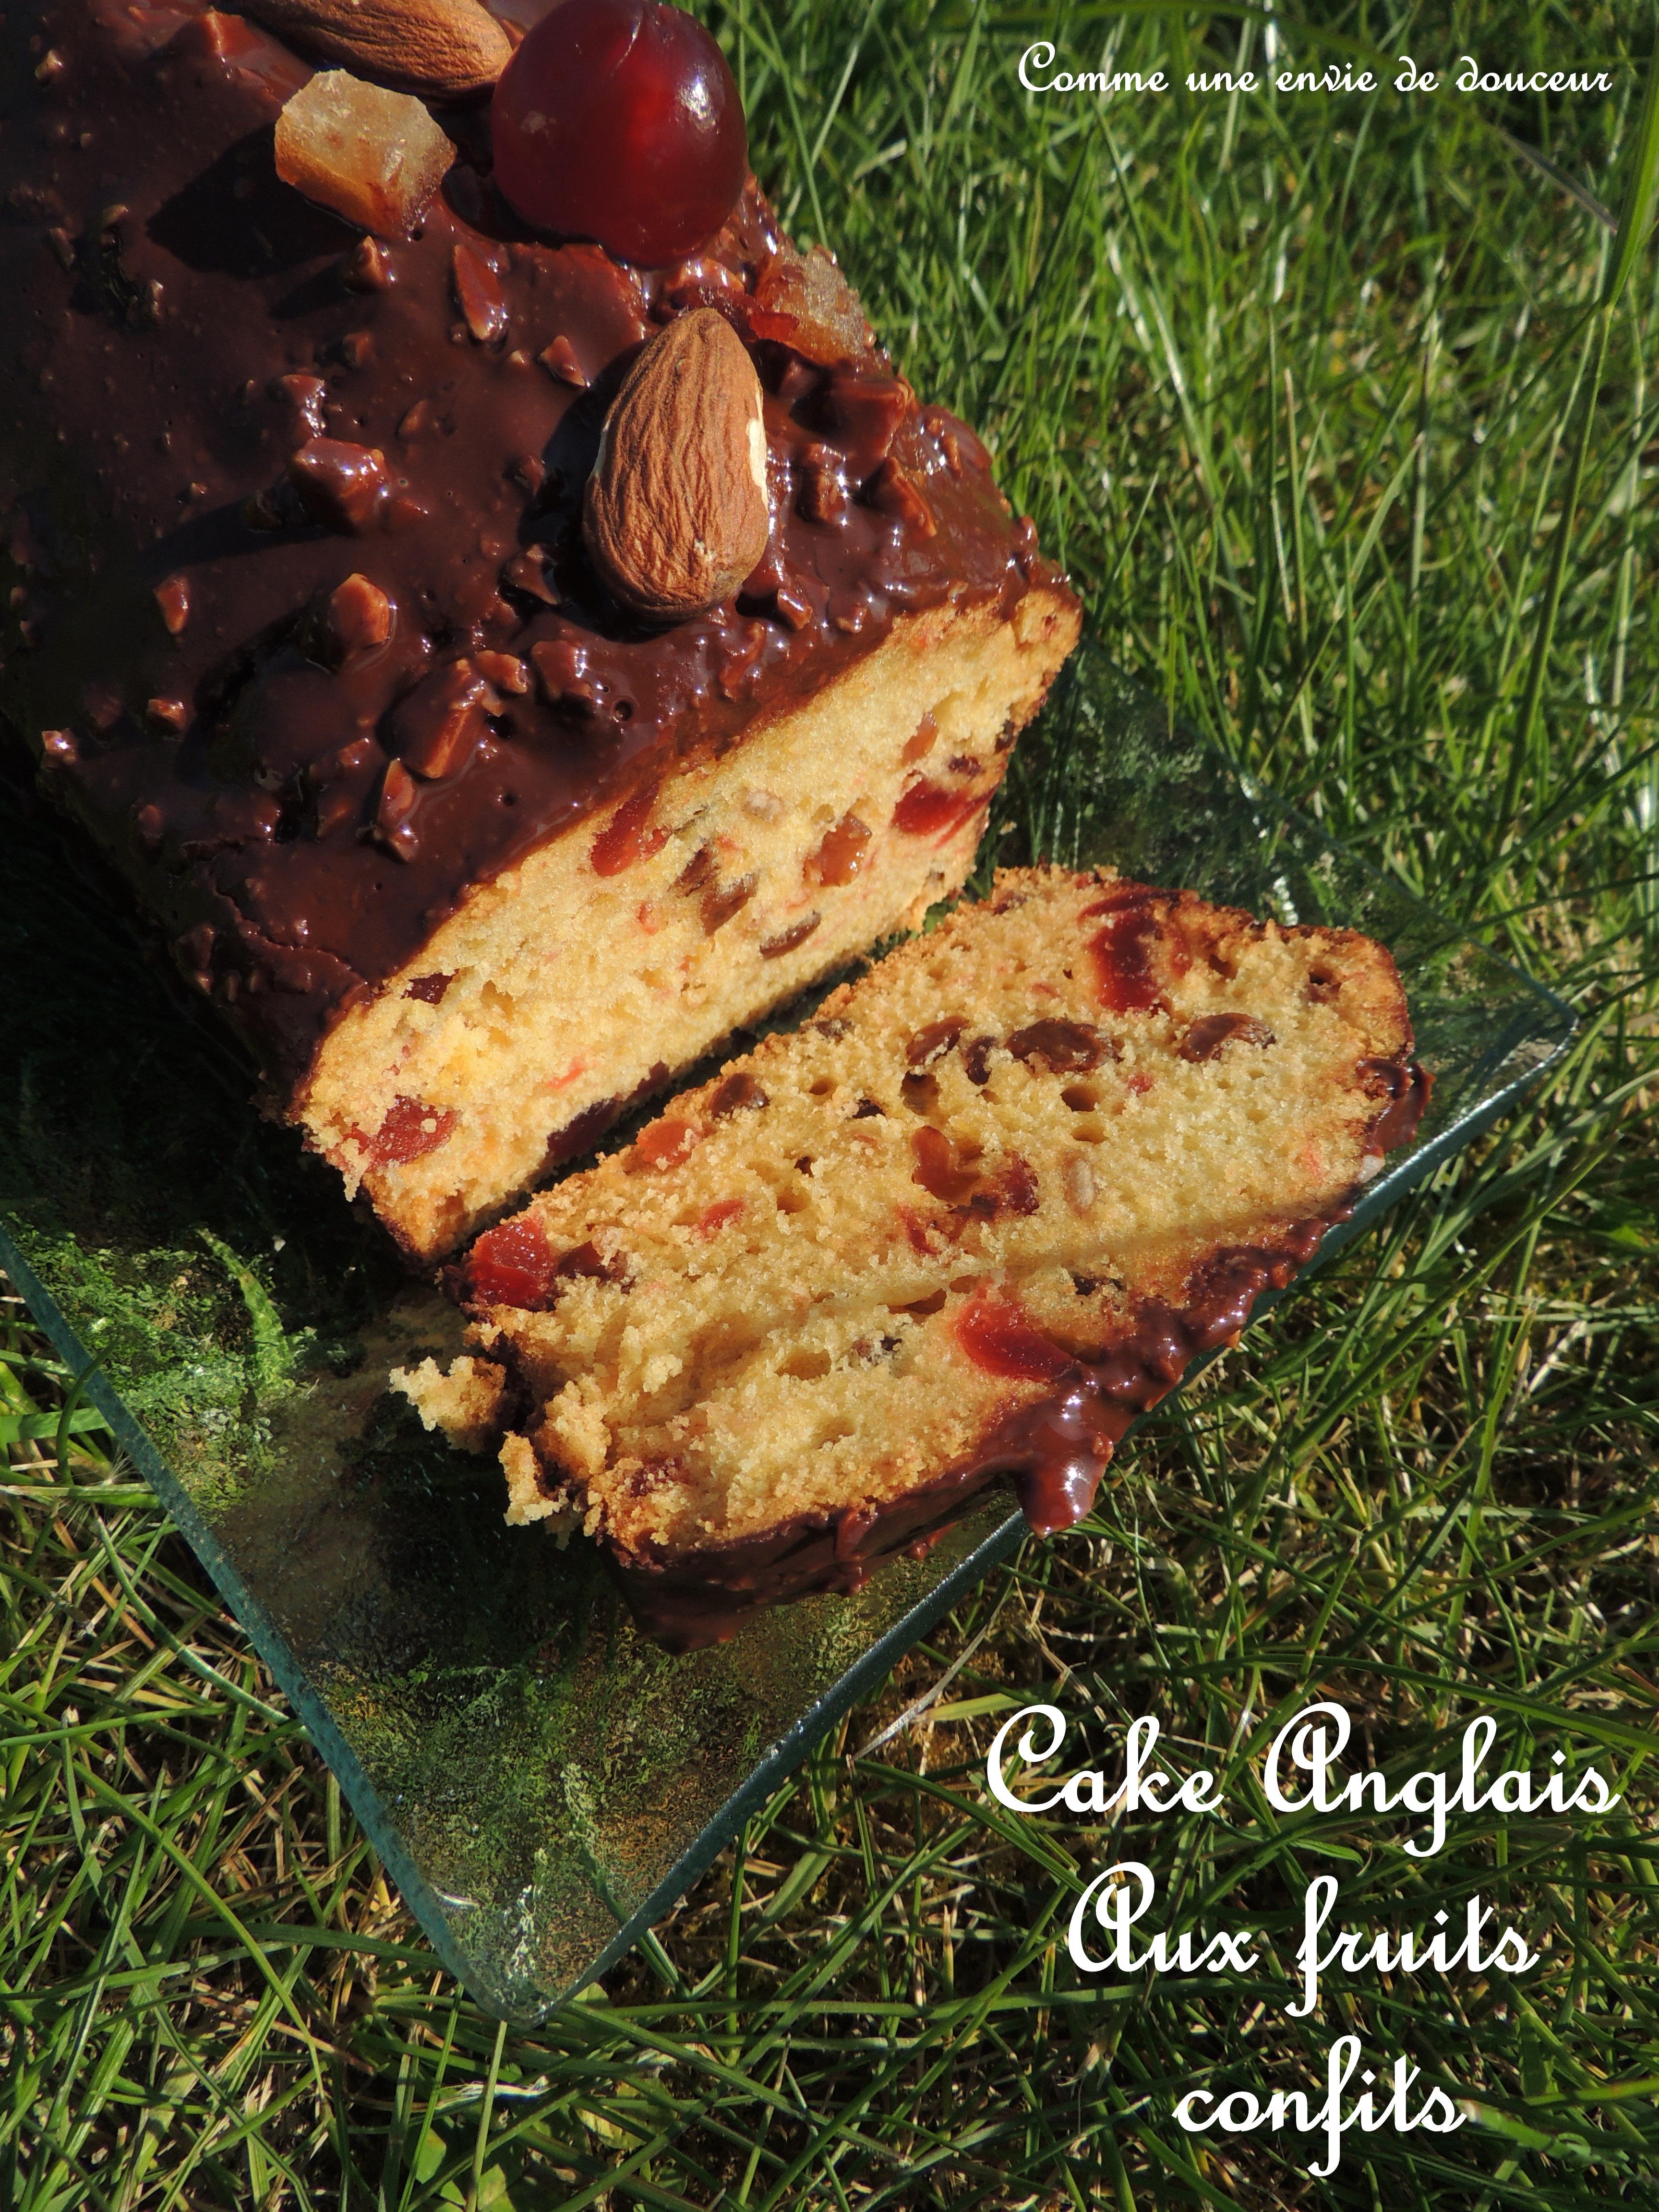 Cake anglais aux fruits confits – English cake